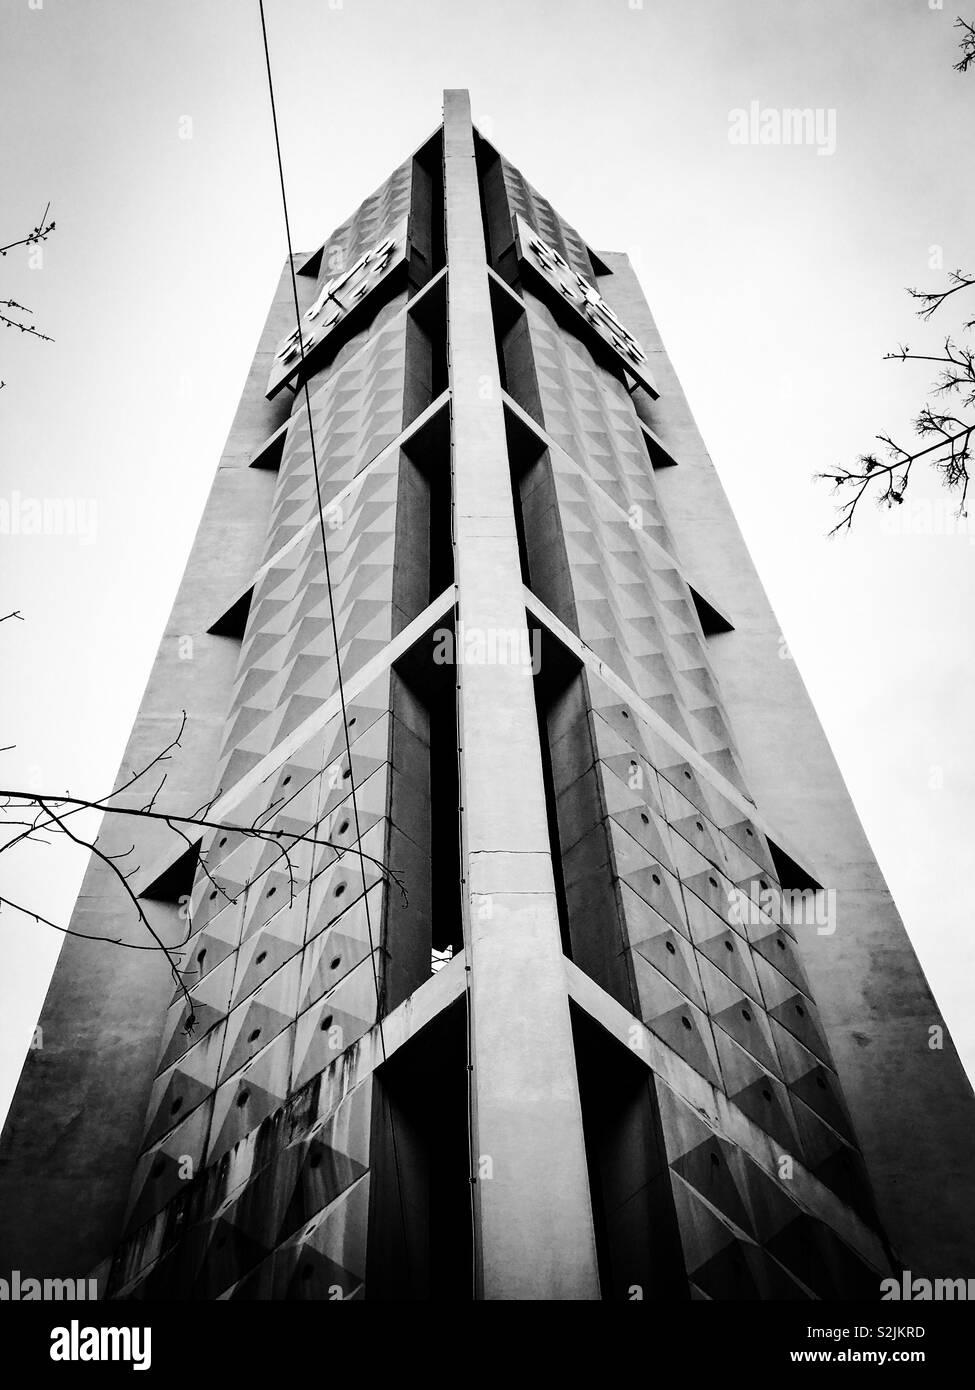 Modern Church Tower - Stock Image